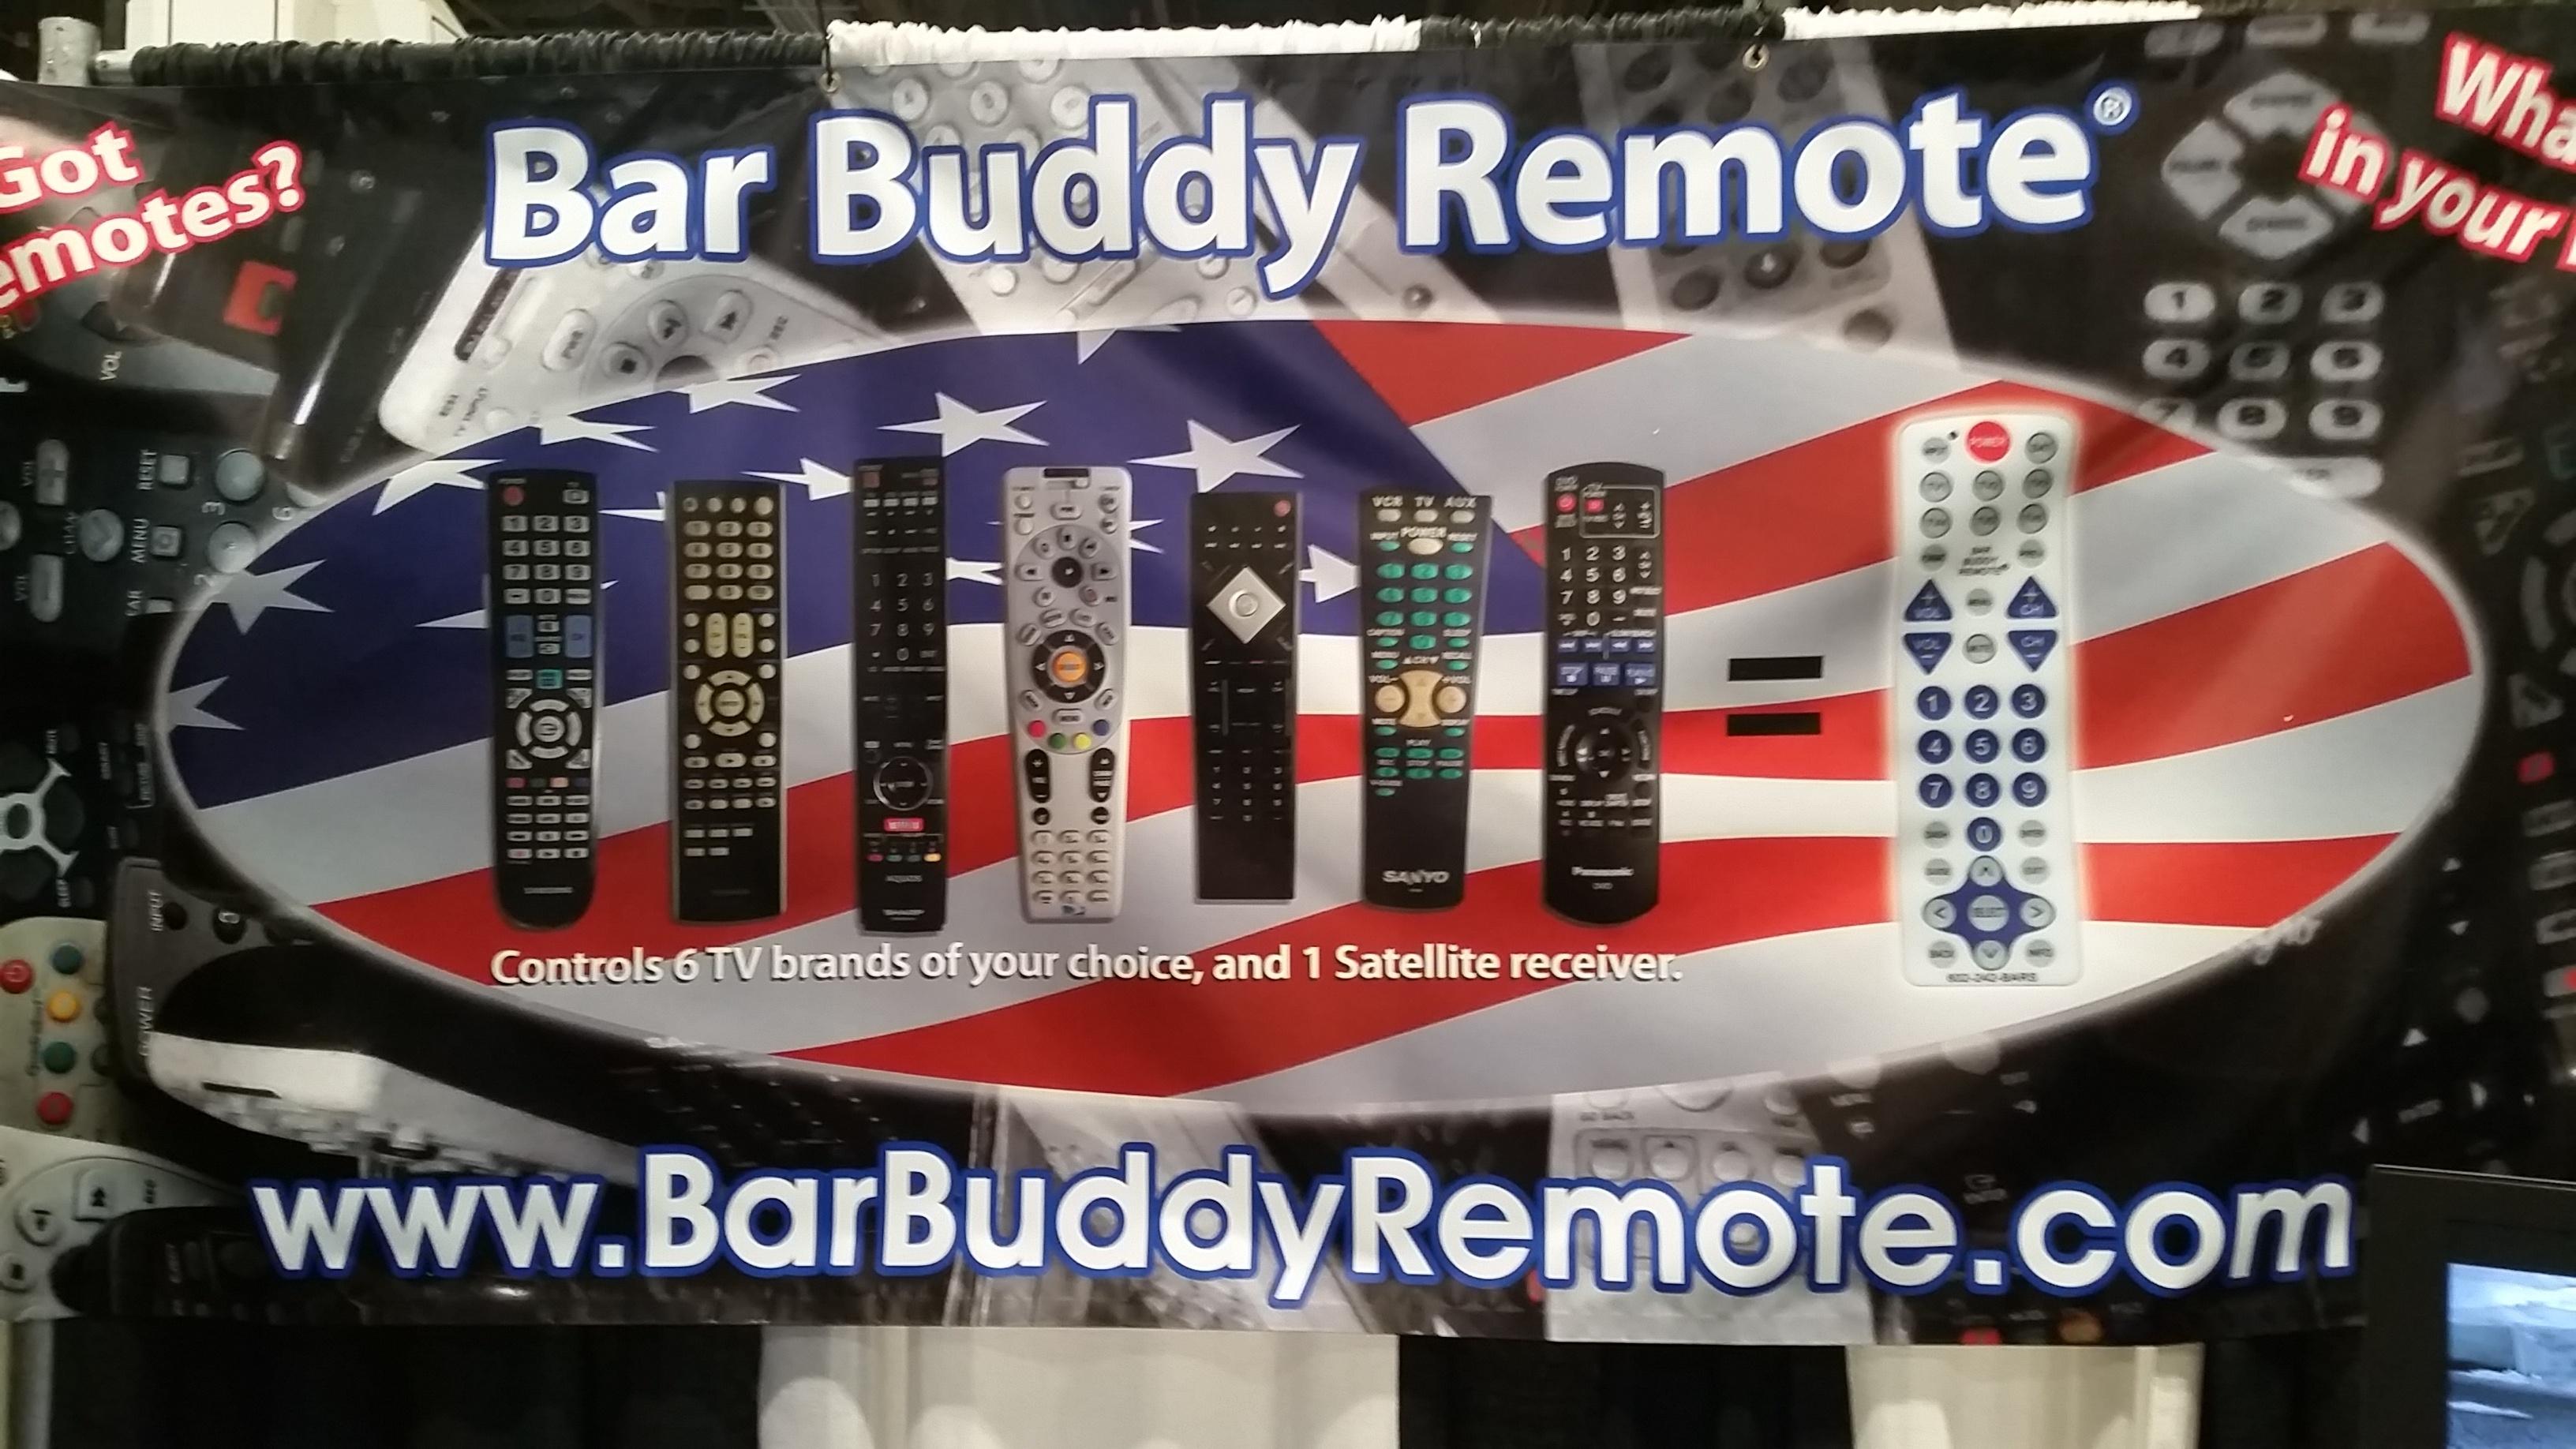 Bar Buddy Remote - NCB Show 2016 Intriguing Products - Bar-i Bar Inventory